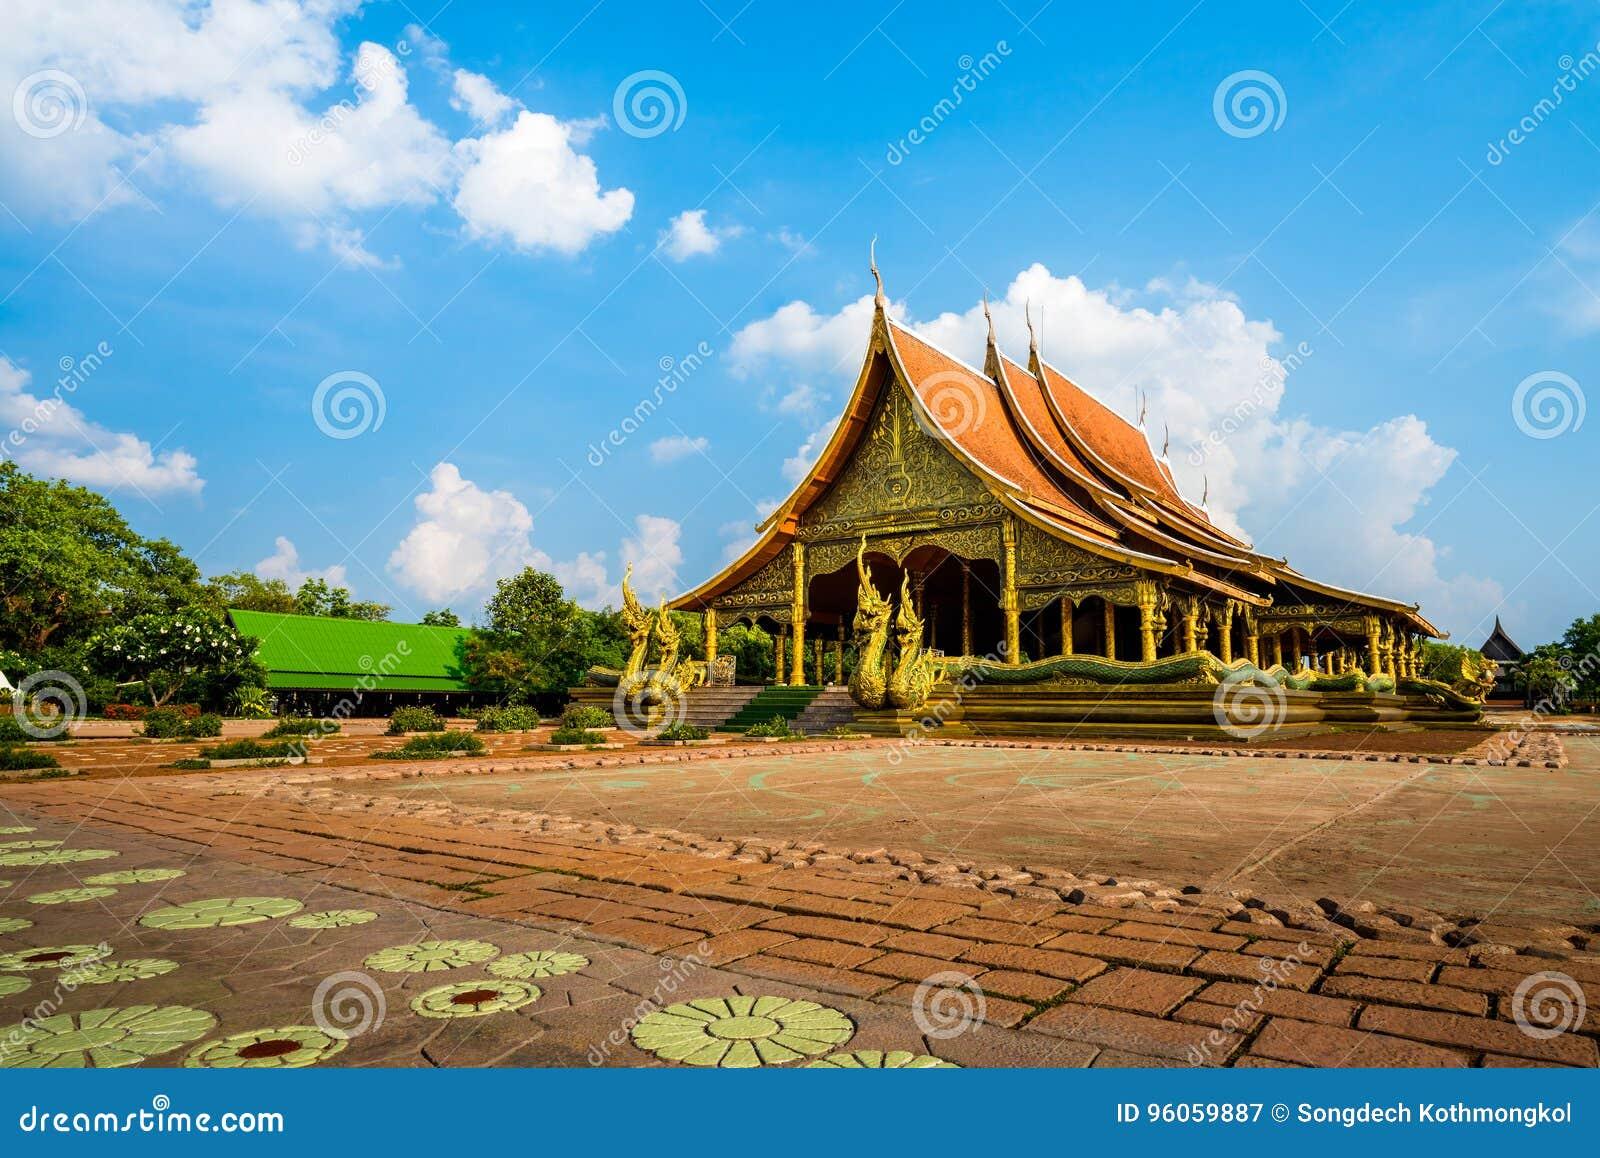 Temple de Wat Sirindhorn Wararam Phu Prao dans Ubon Ratchathani, thaïlandais